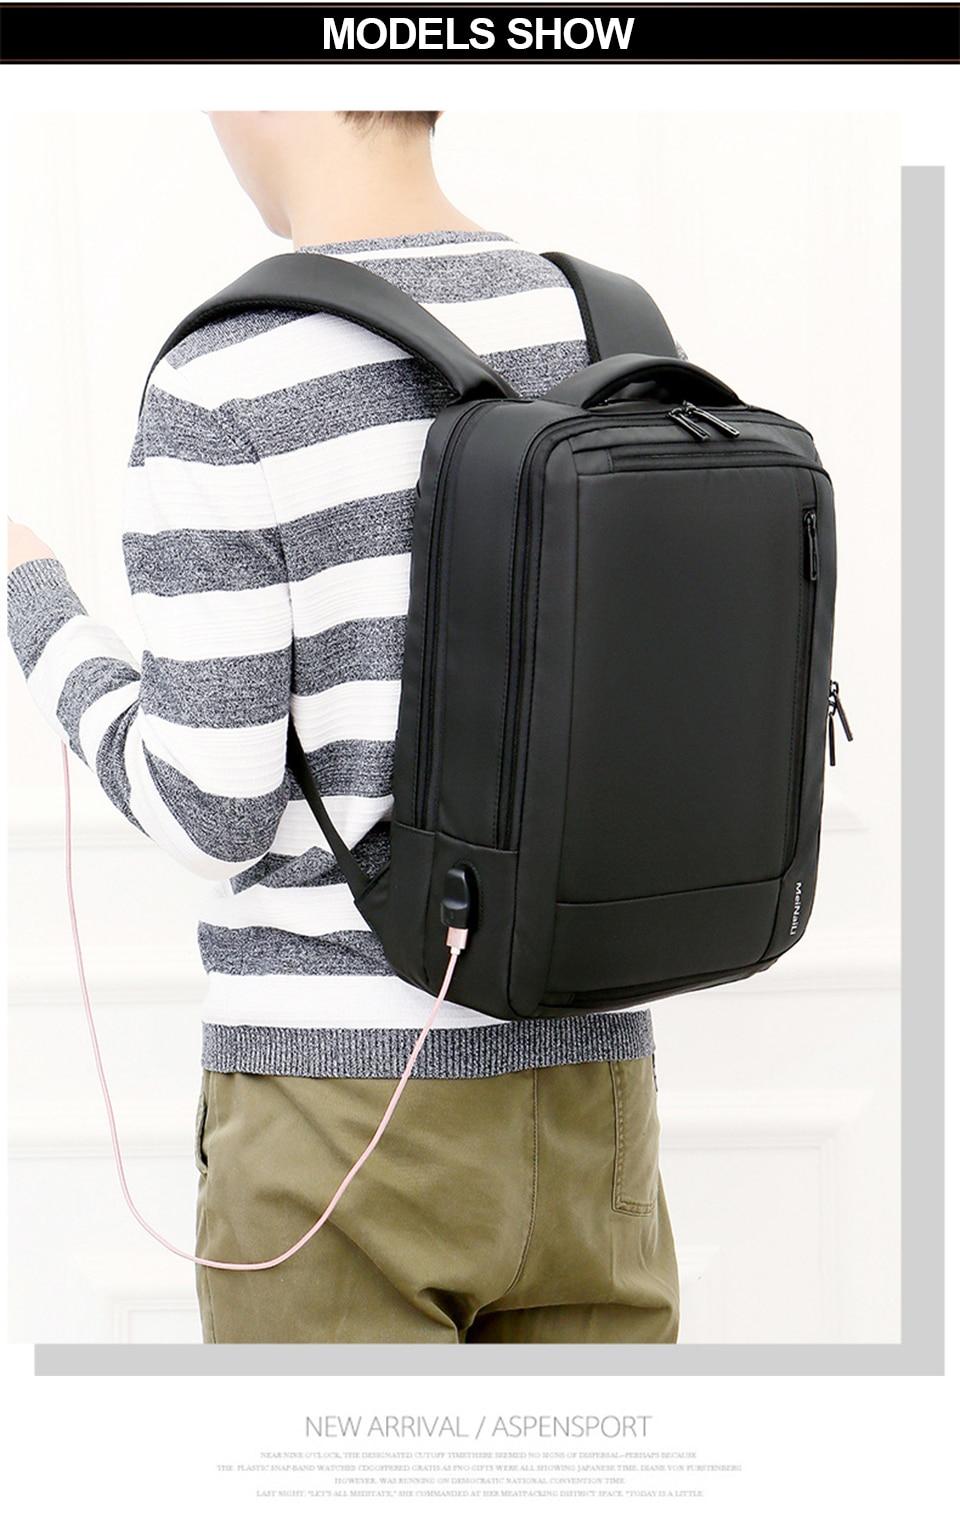 10 Multifunction USB Backpack Man Bag 15.6inch Laptop Backpacks Travel Bags Large Capacity Luggage Backpacking Waterproof Notebook